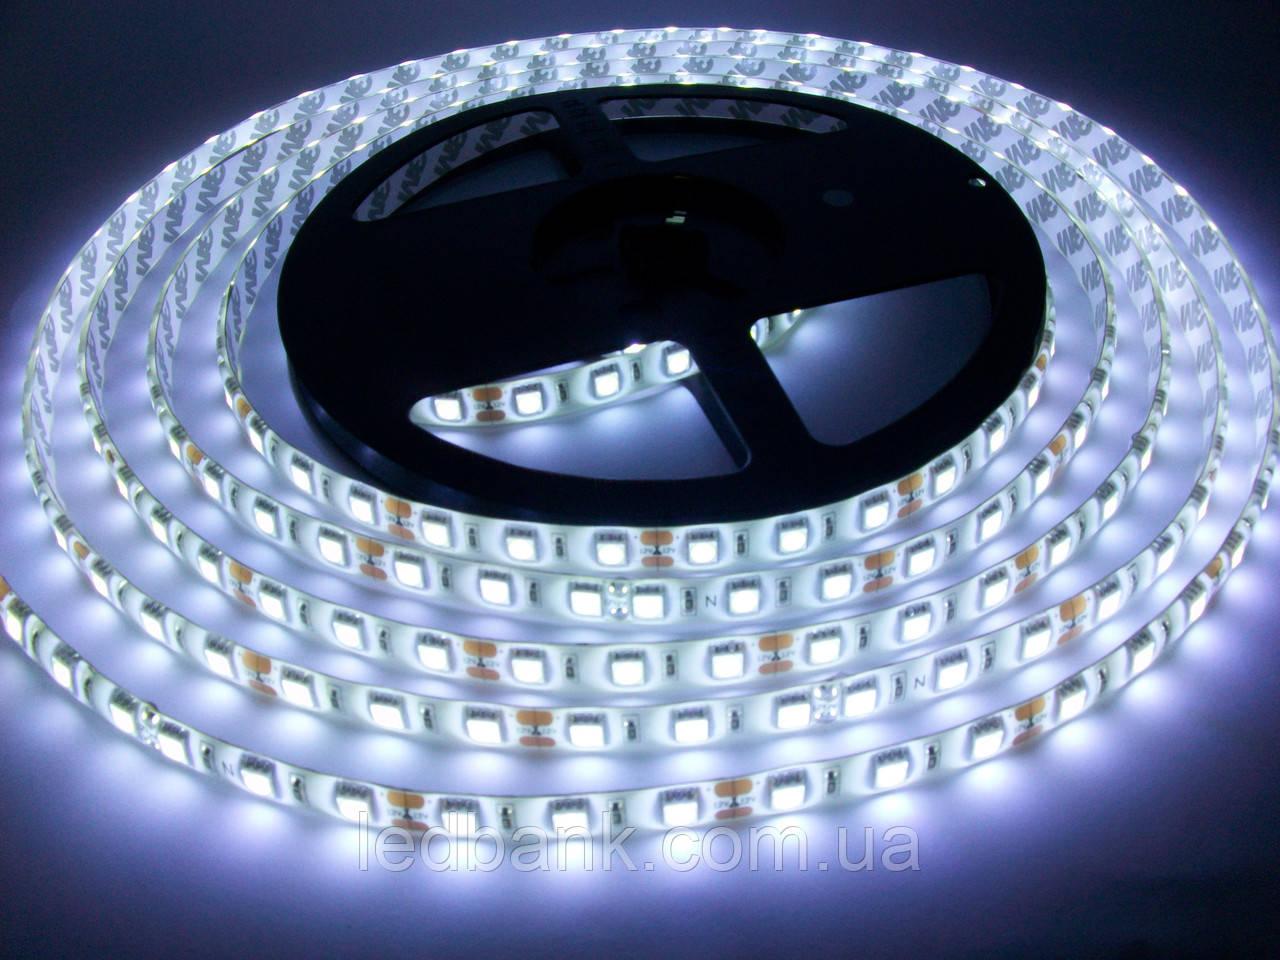 Світлодіодна стрічка SMD 5050 60 LED/m IP 65 Standart White